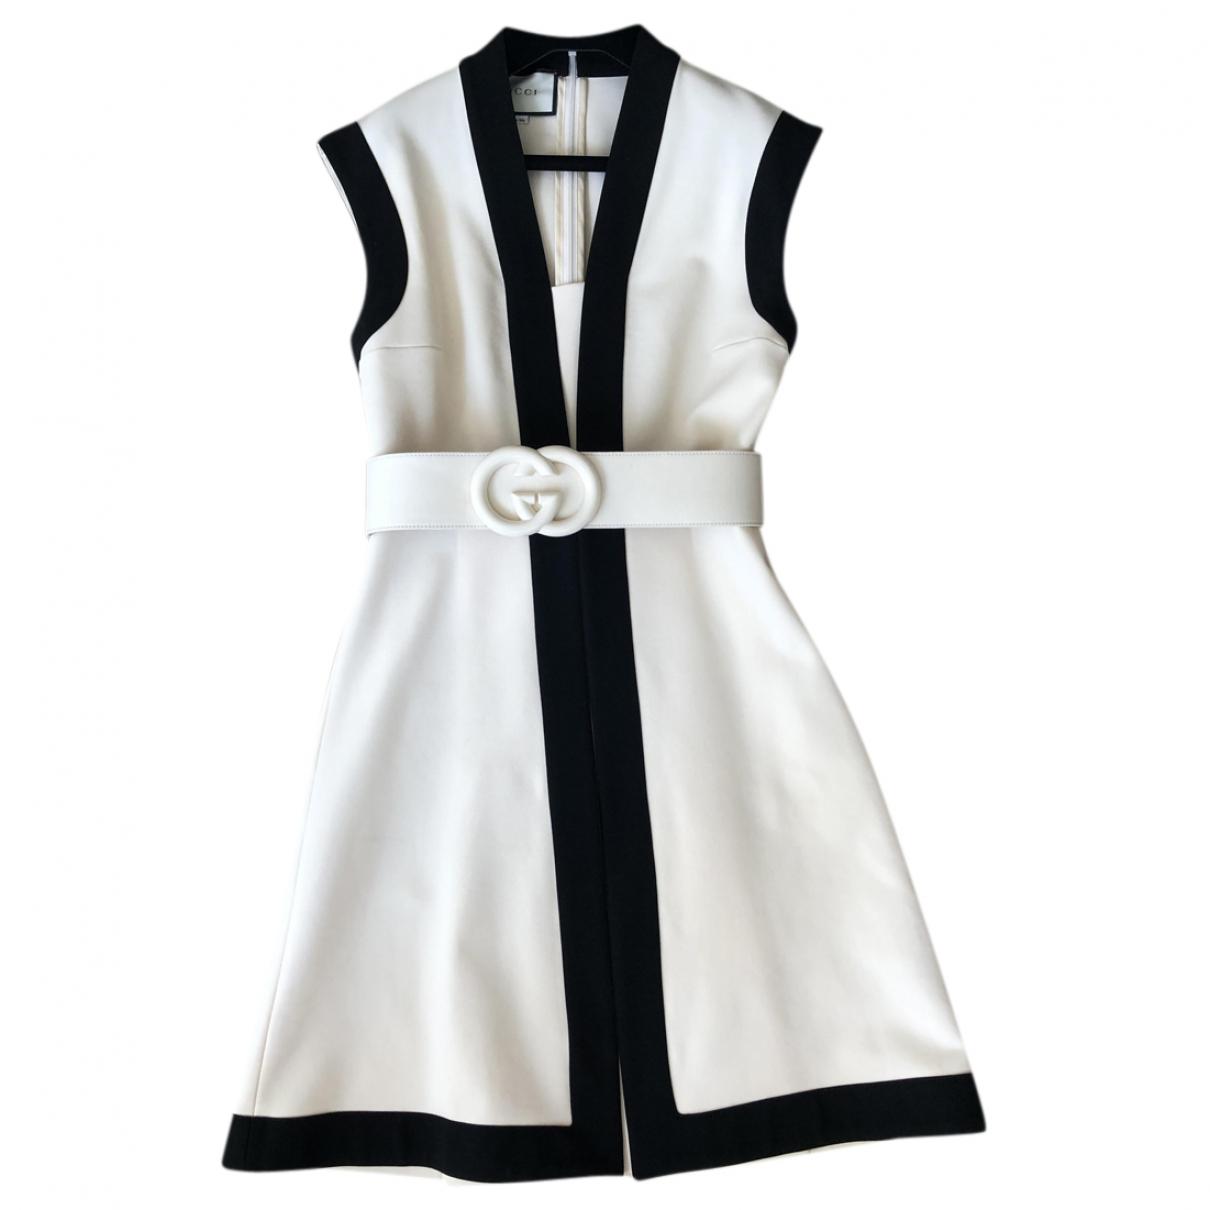 Gucci \N White dress for Women S International